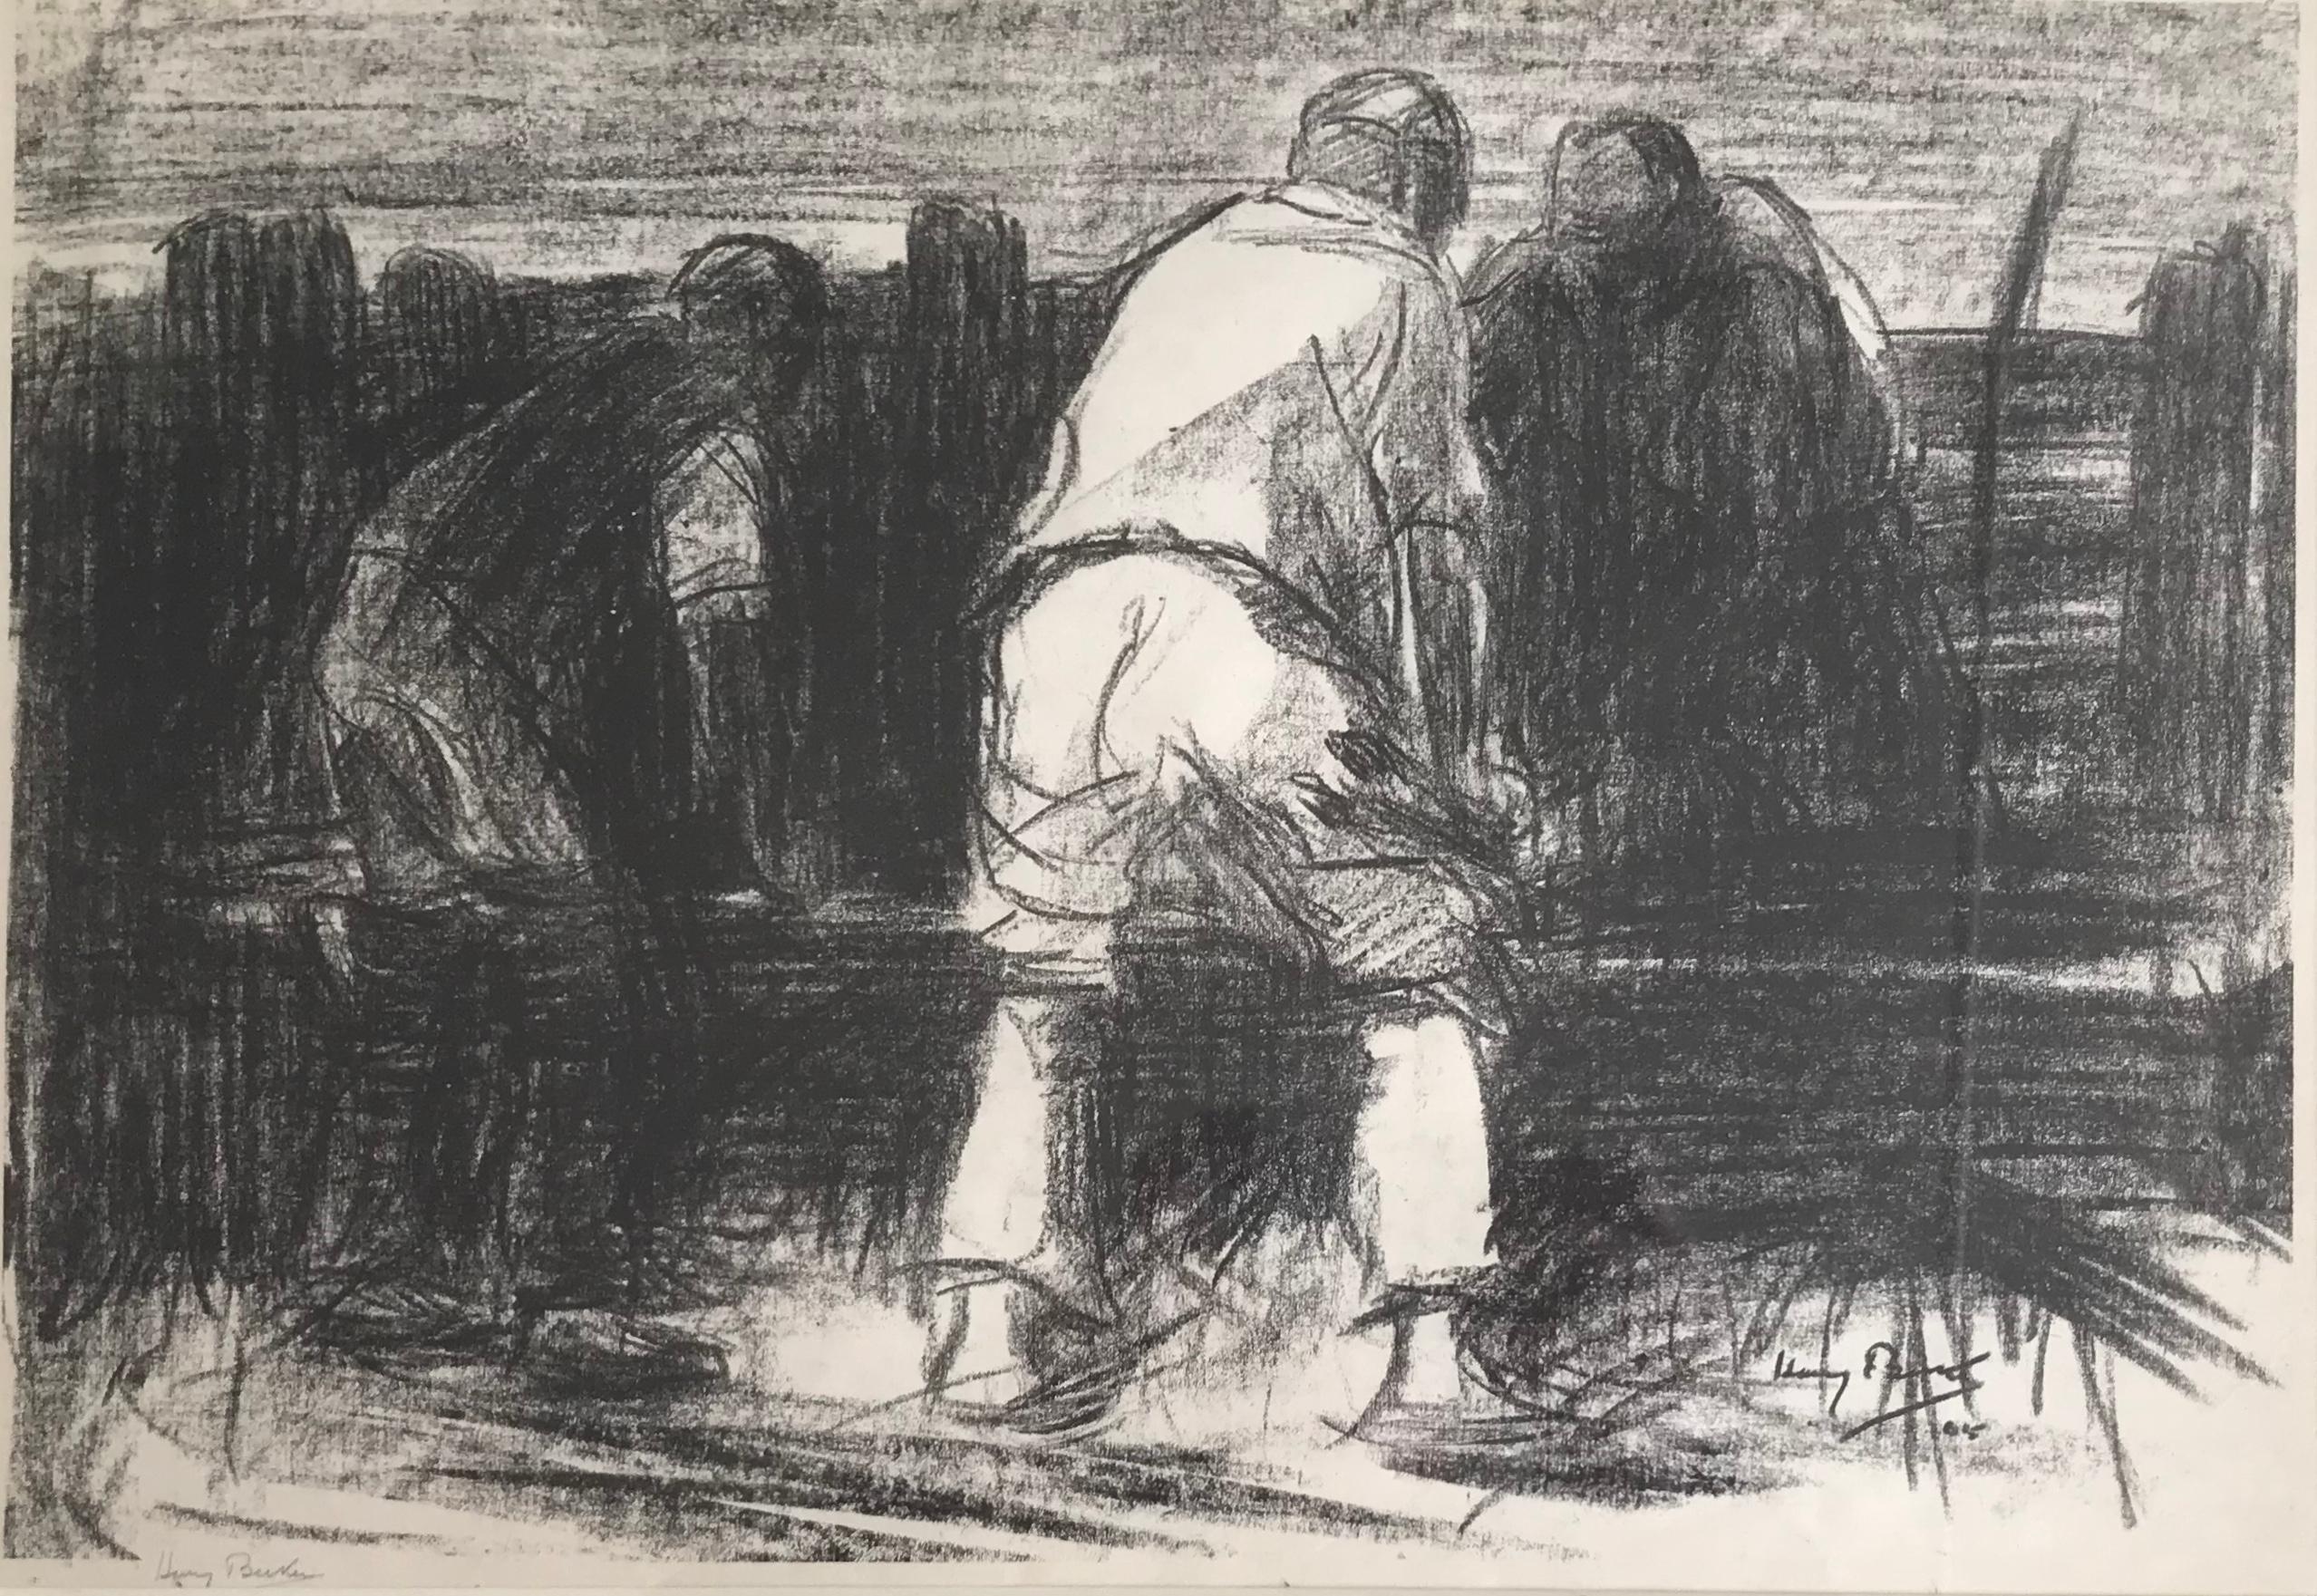 Harry Becker, Sheep dipping, English rural scene